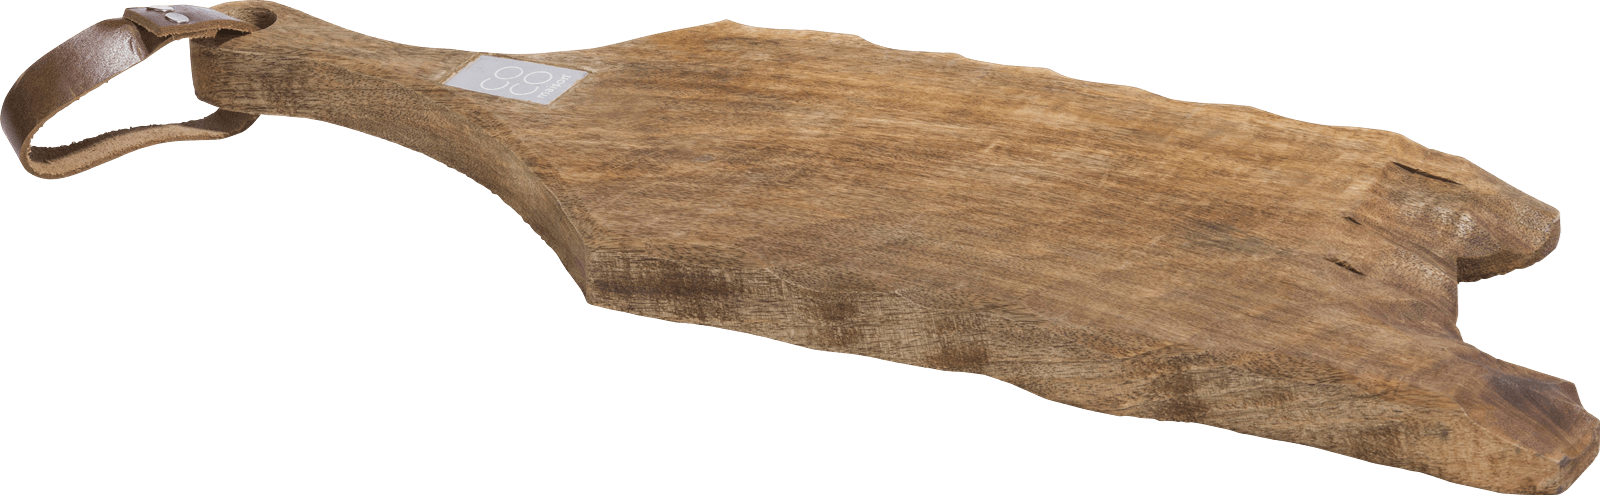 Coco Maison - schneidebrett manilla - 20 x 64 cm